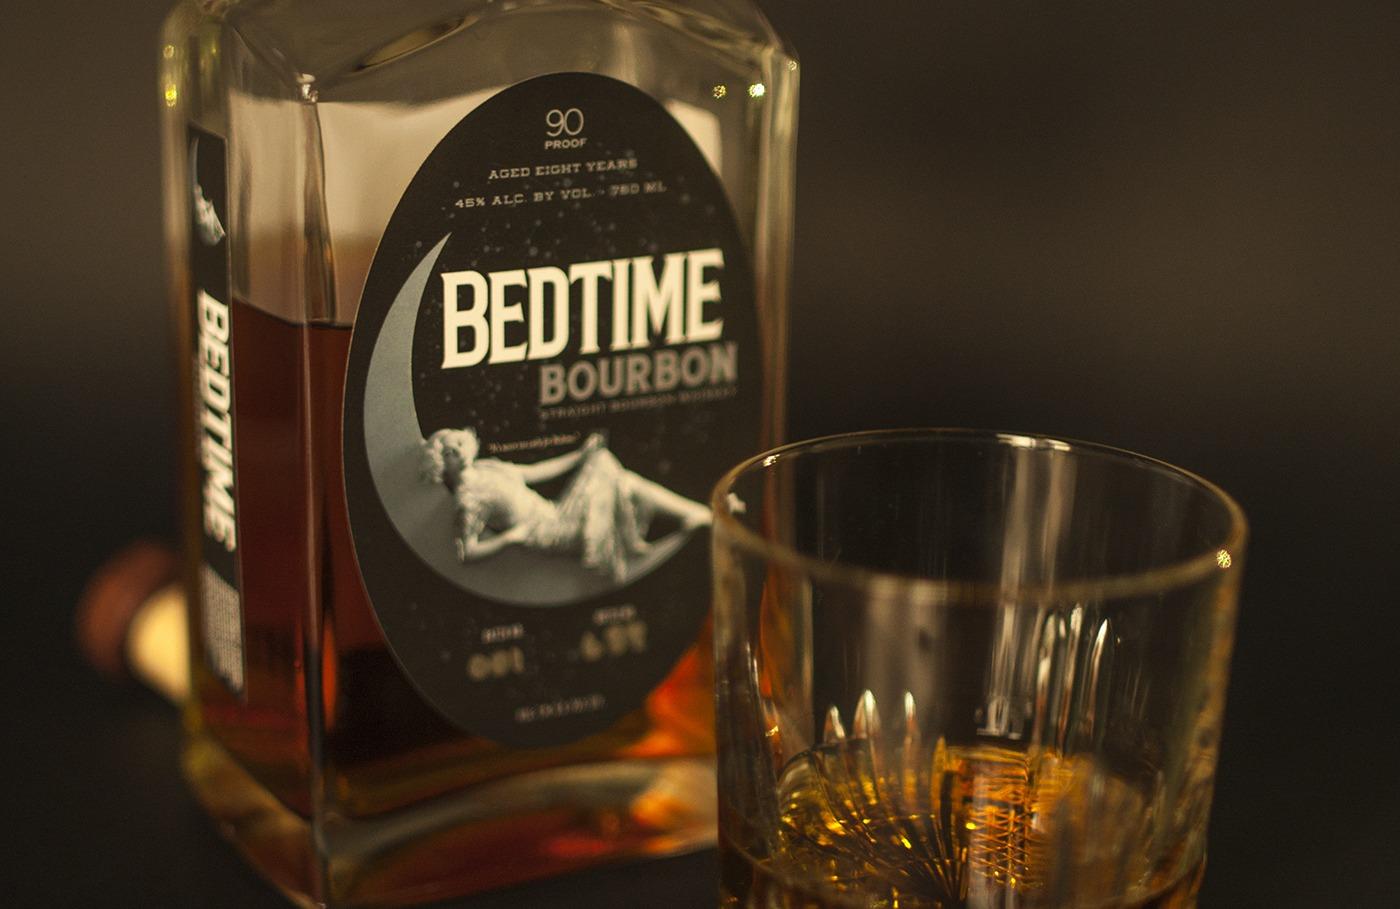 Bedtime Bourbon